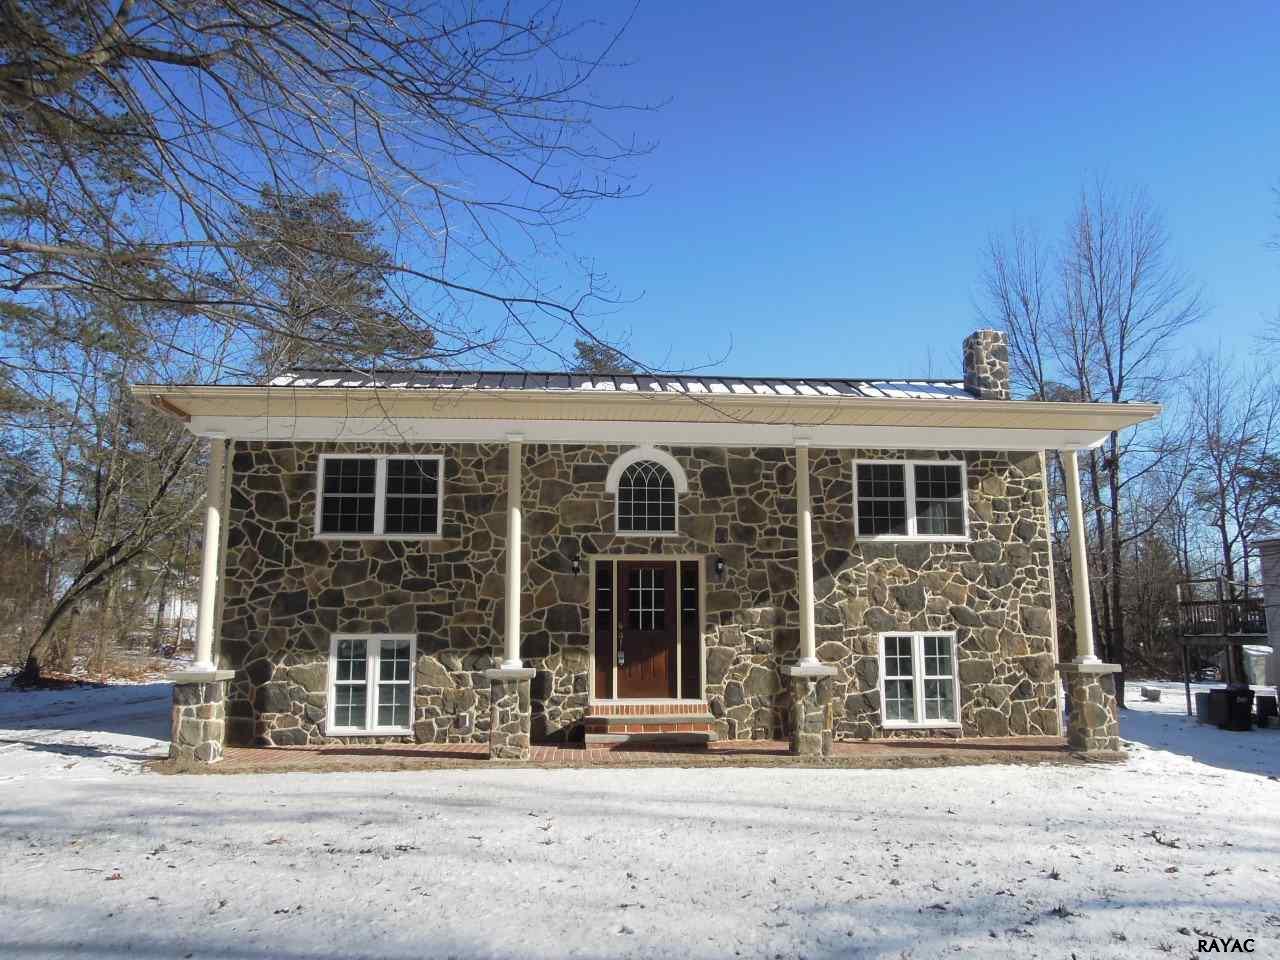 271 Longstreet Dr, Gettysburg, PA 17325